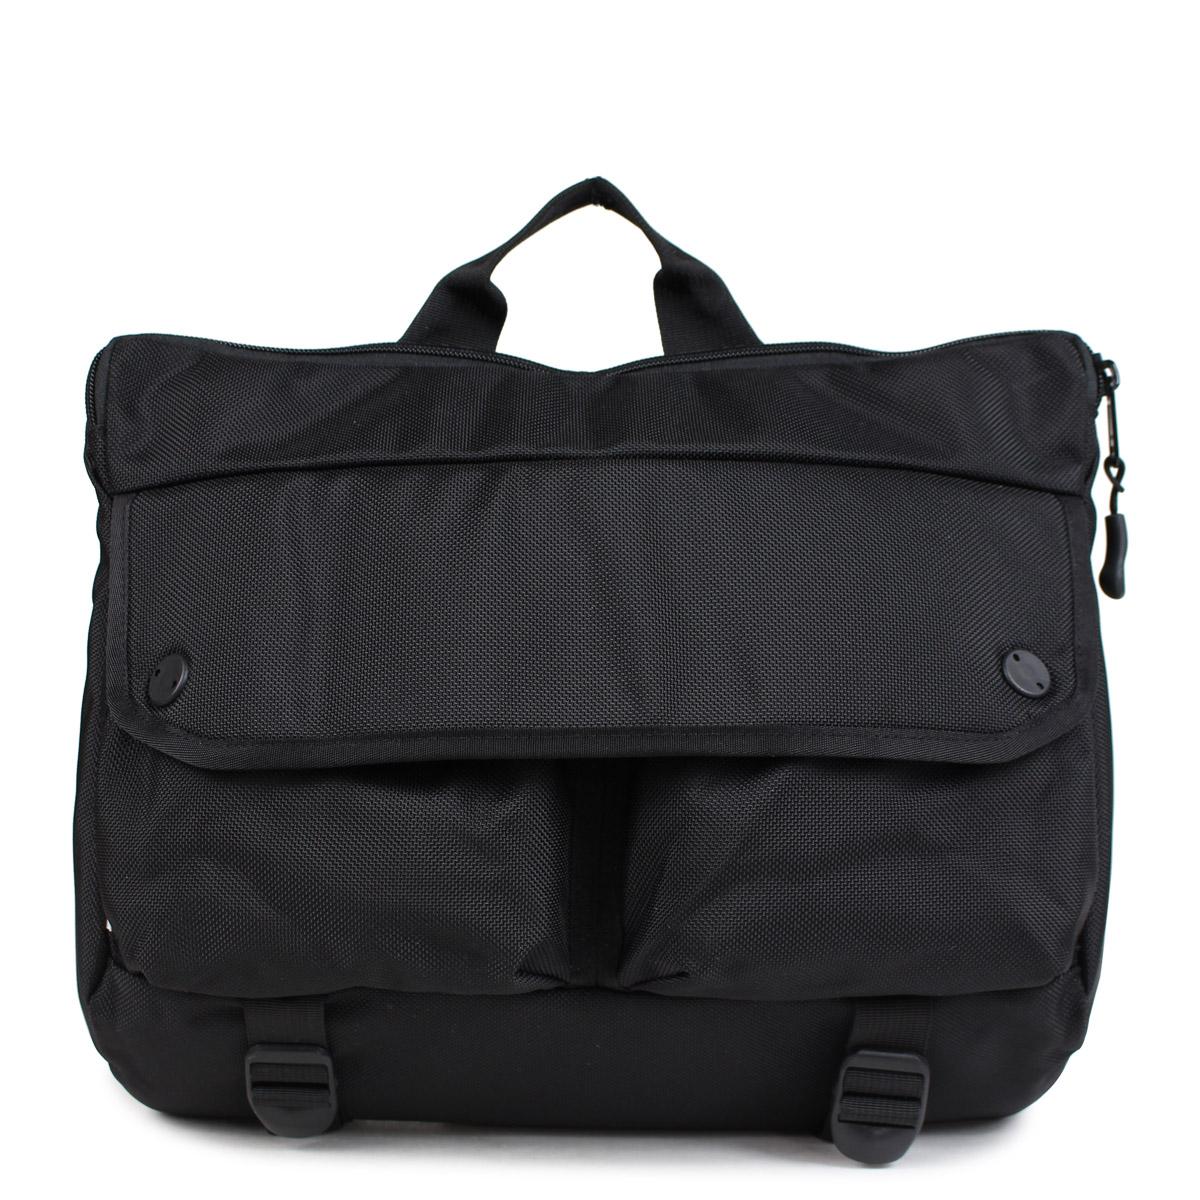 DSPTCH SHOULDER BAG ディスパッチ バッグ ショルダーバッグ 12L メンズ レディース ブラック PCK-SB [10/9 新入荷] [1810]